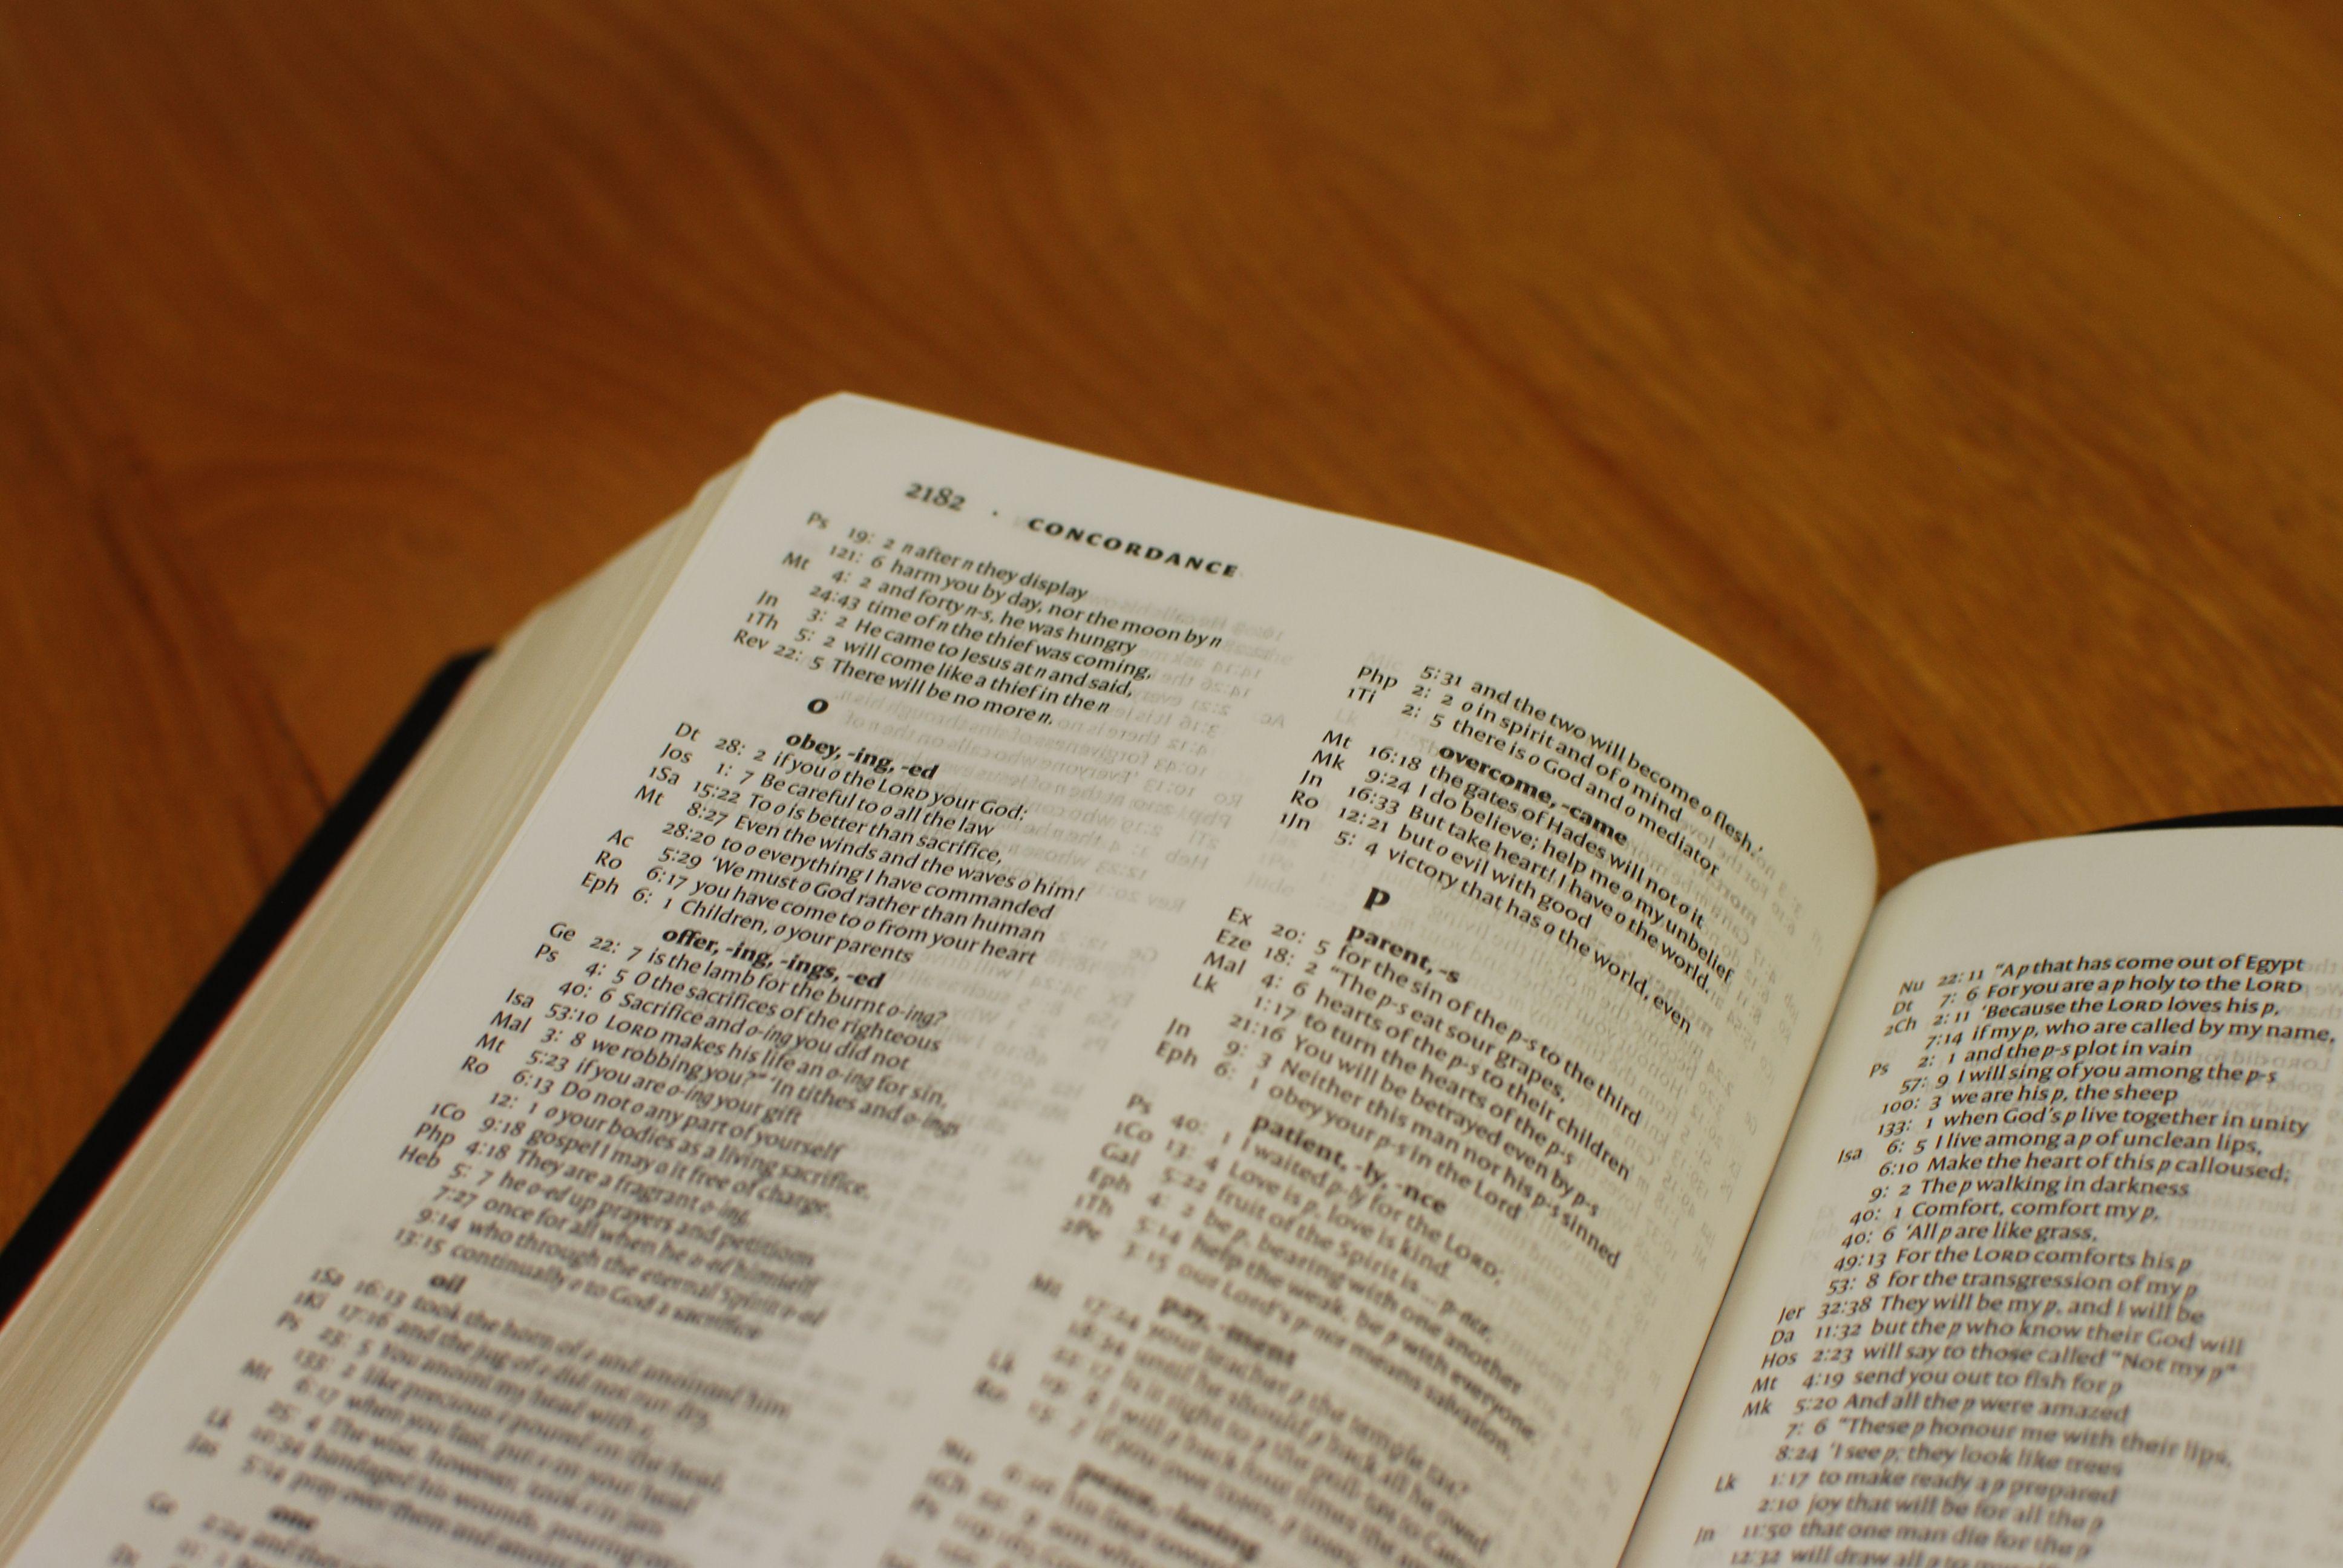 Niv tiny white christening bible 9781444702118 1299 niv niv tiny white christening bible 9781444702118 1299 niv bible latest niv bibles from hodder pinterest niv bible negle Image collections